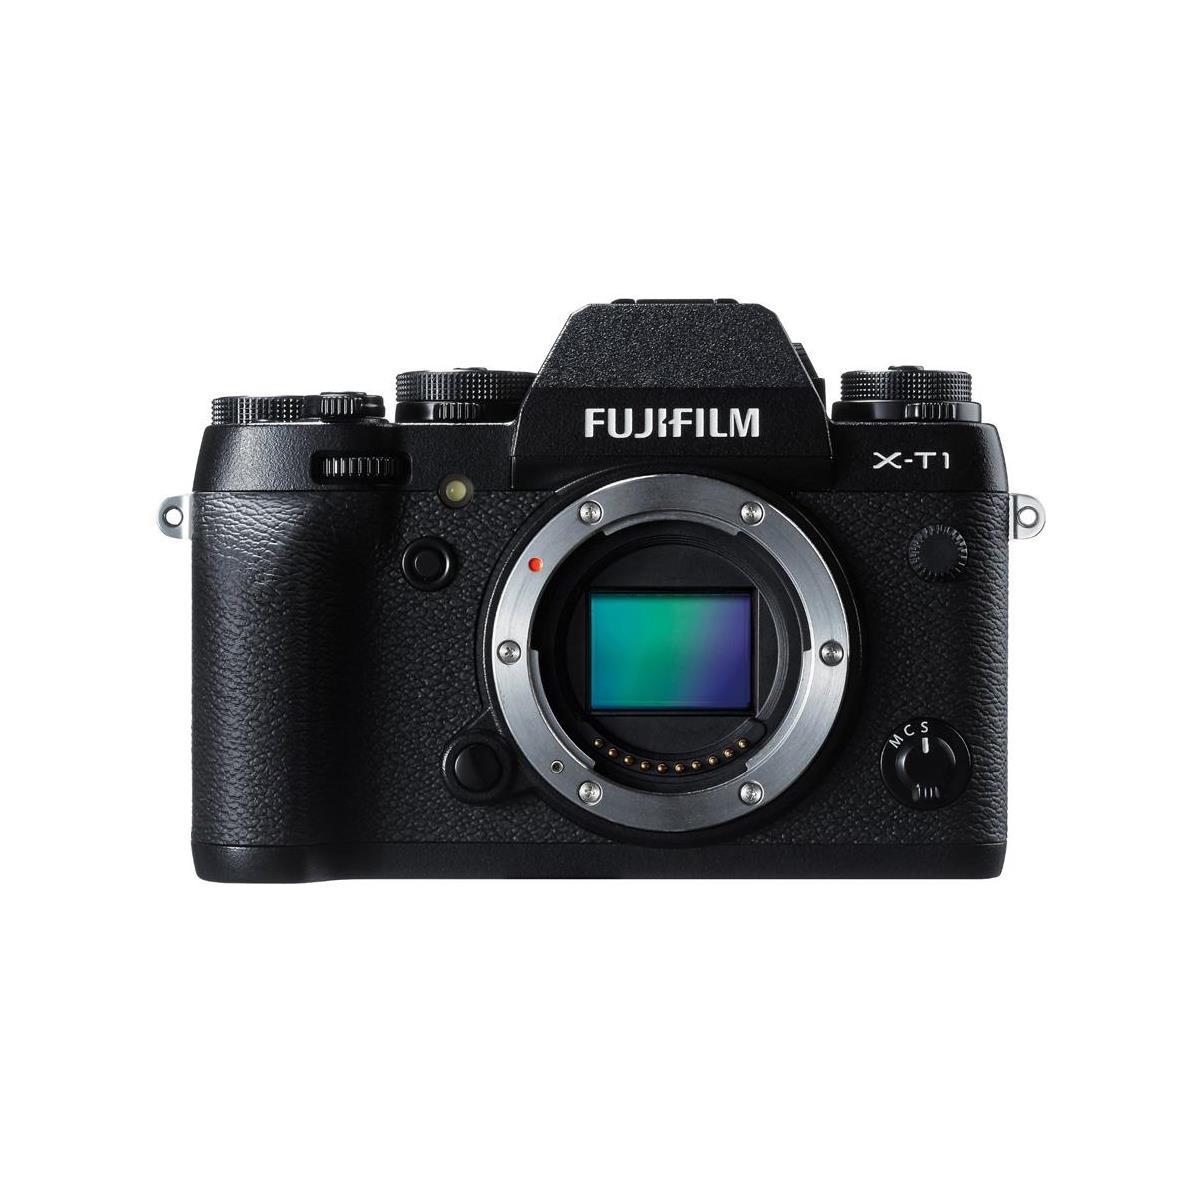 Fujifilm Camera Sale: X-T1 Body $799 or w/  XF 18-55mm f/2.8-4 Lens $1199, X100T w/ 23mm F/2 Lens $1099, Fujifilm X-T10 $599 + Adorama Cash + Free shipping